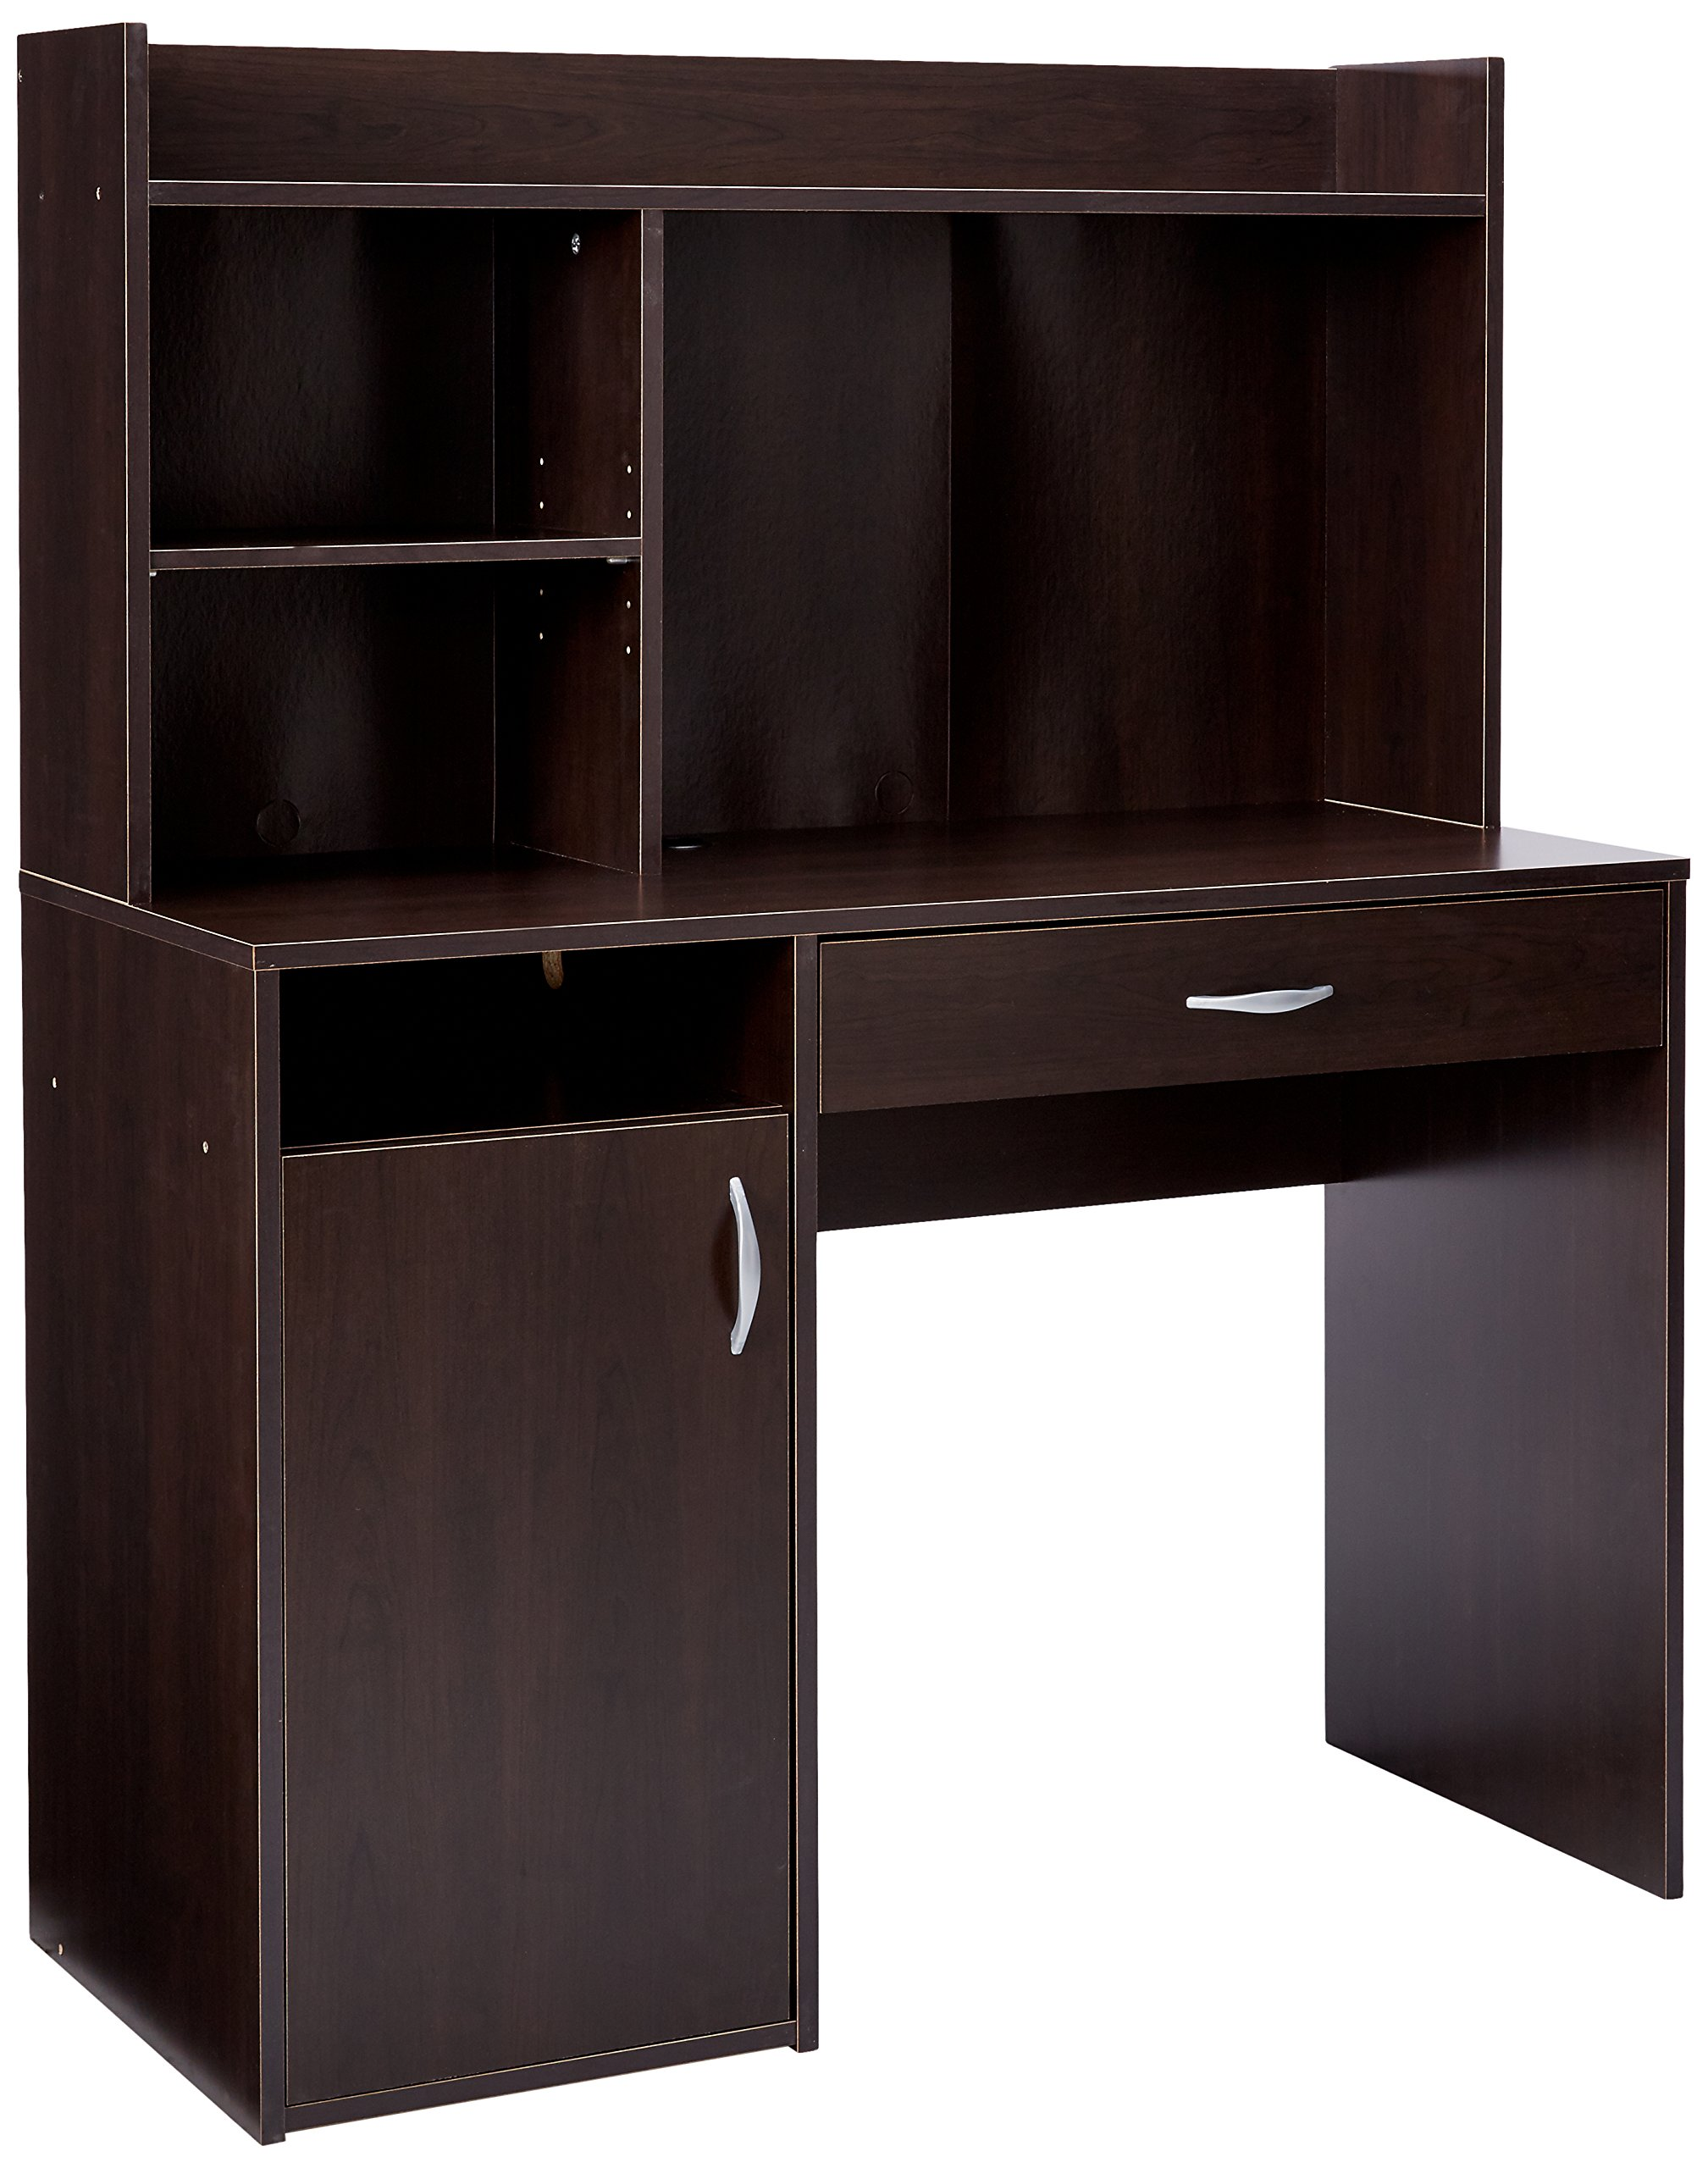 Sauder 413084 Beginnings Desk with Hutch, L: 42.91'' x W: 19.45'' x H: 53.47'', Cinnamon Cherry finish by Sauder